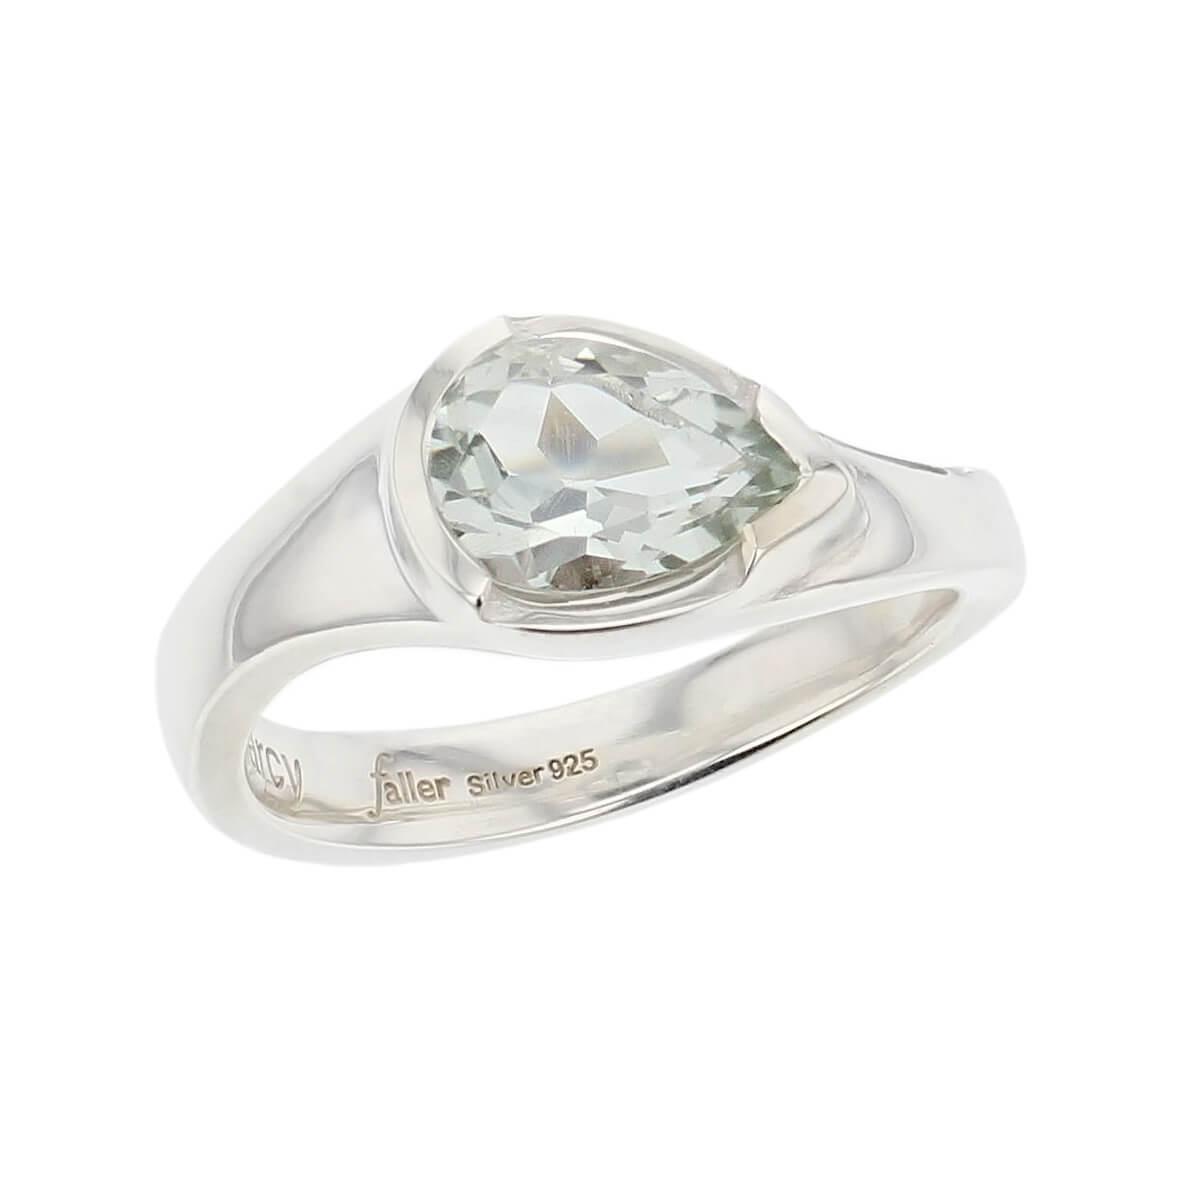 sterling silver pear cut faceted prasiolite gemstone dress ring, designer jewellery, green quartz gem, jewelry, handmade by Faller, Londonderry, Northern Ireland, Irish hand crafted, darcy, D'arcy